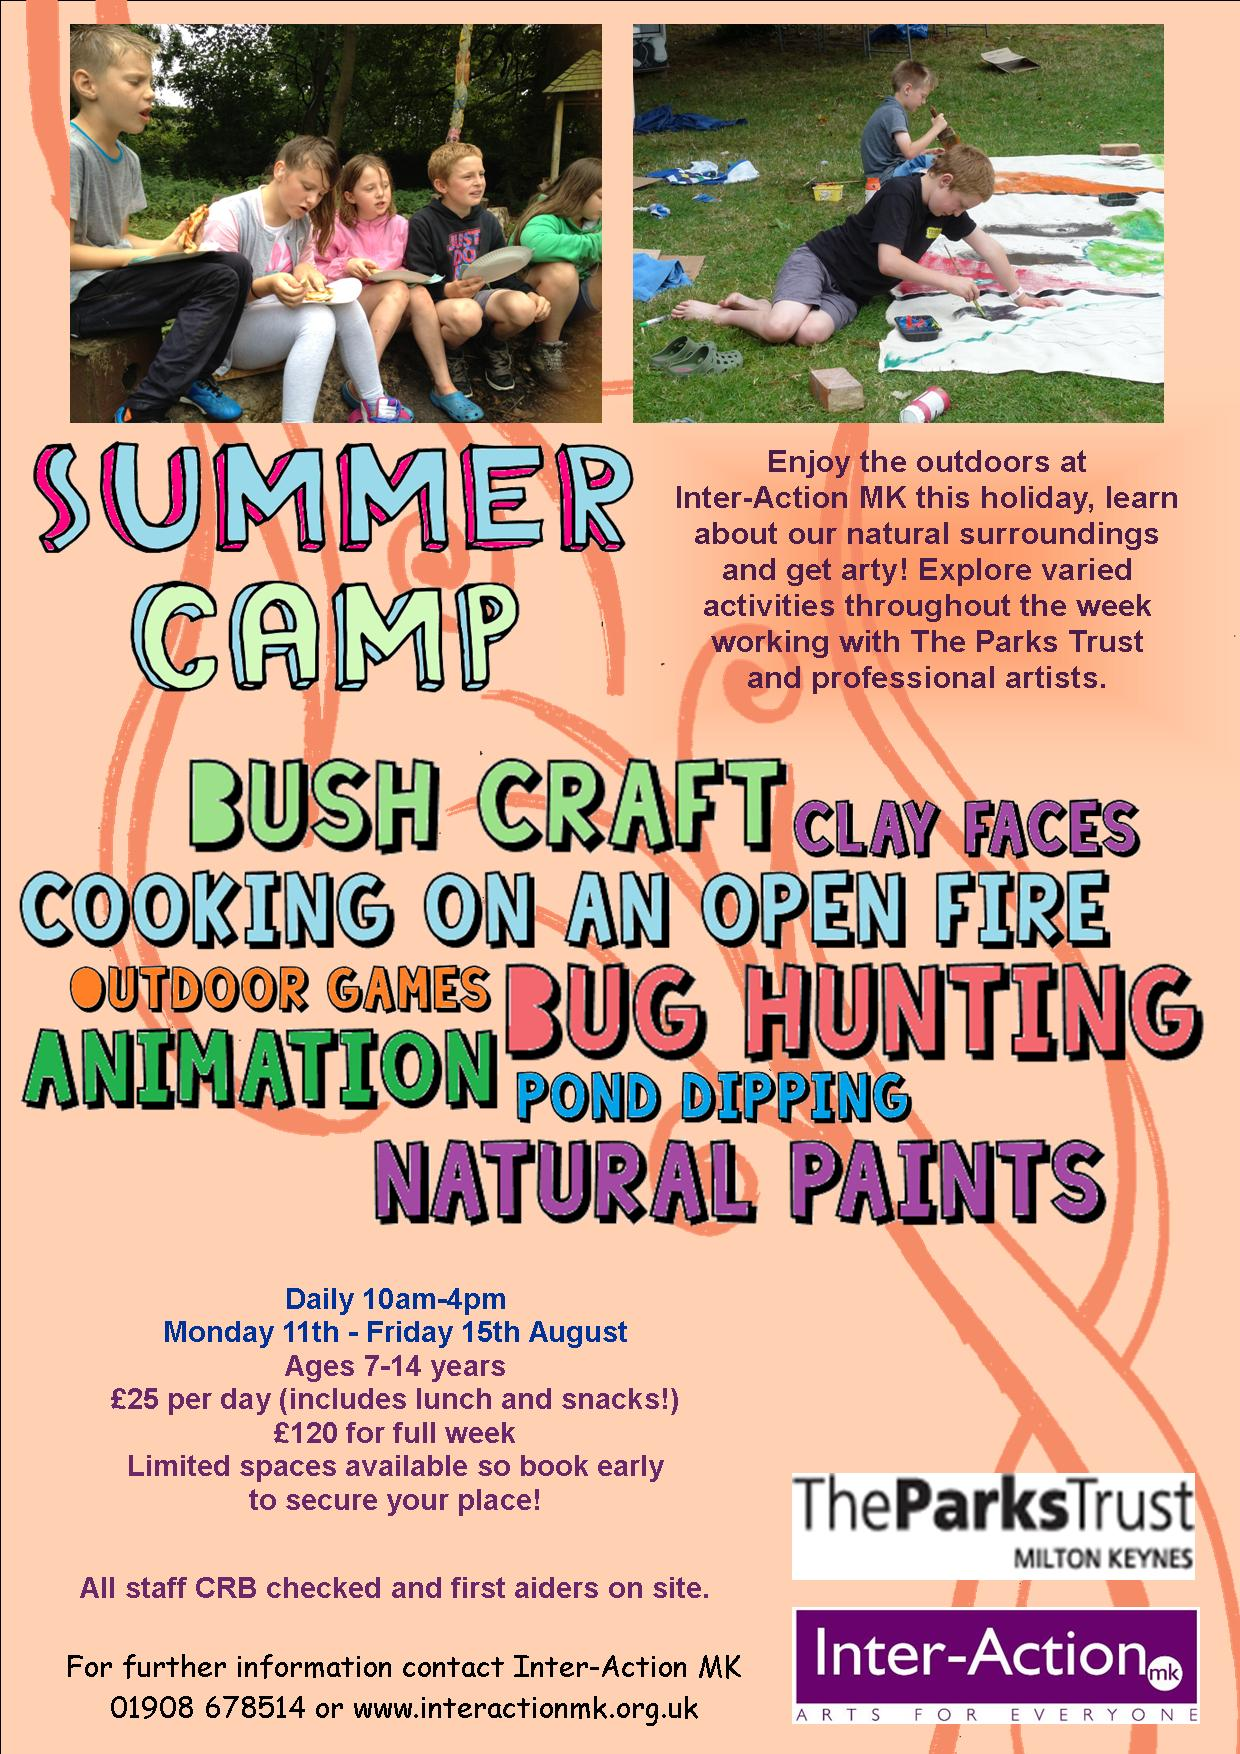 Summer Camp Flyer 2014